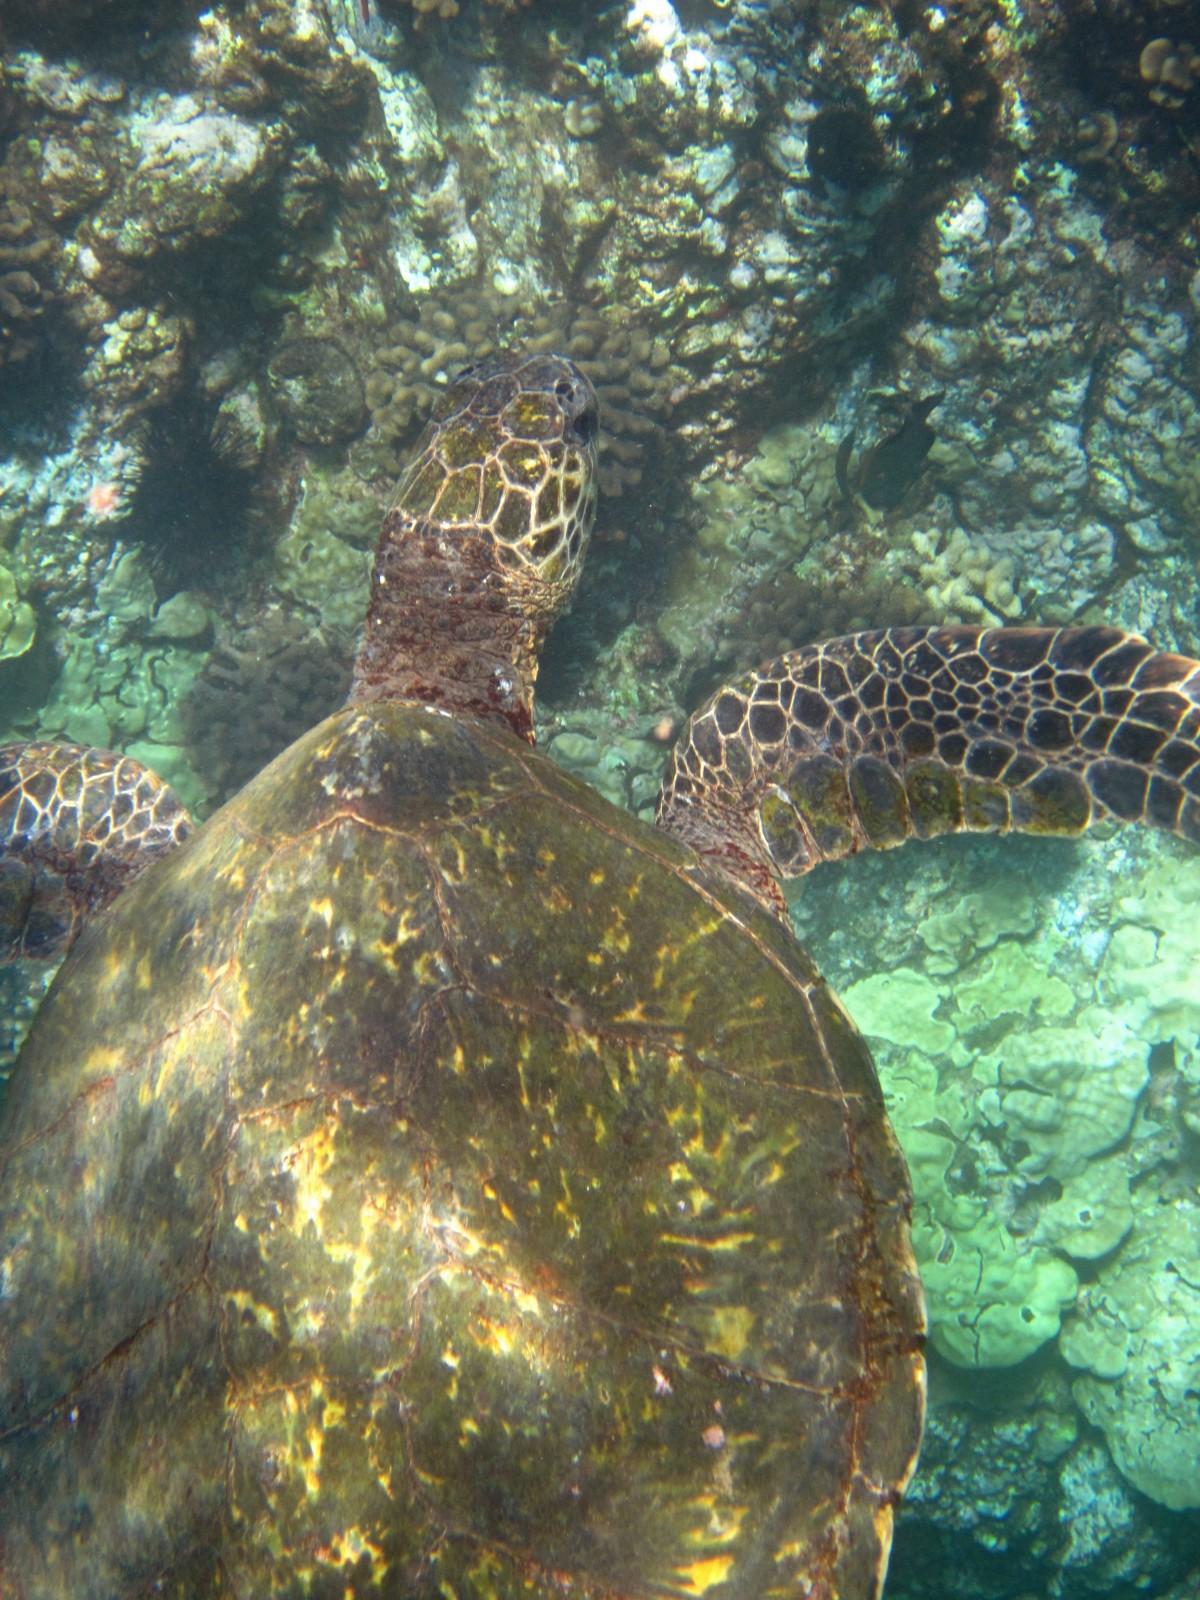 Free Images : wildlife, underwater, sea turtle, freedom ...